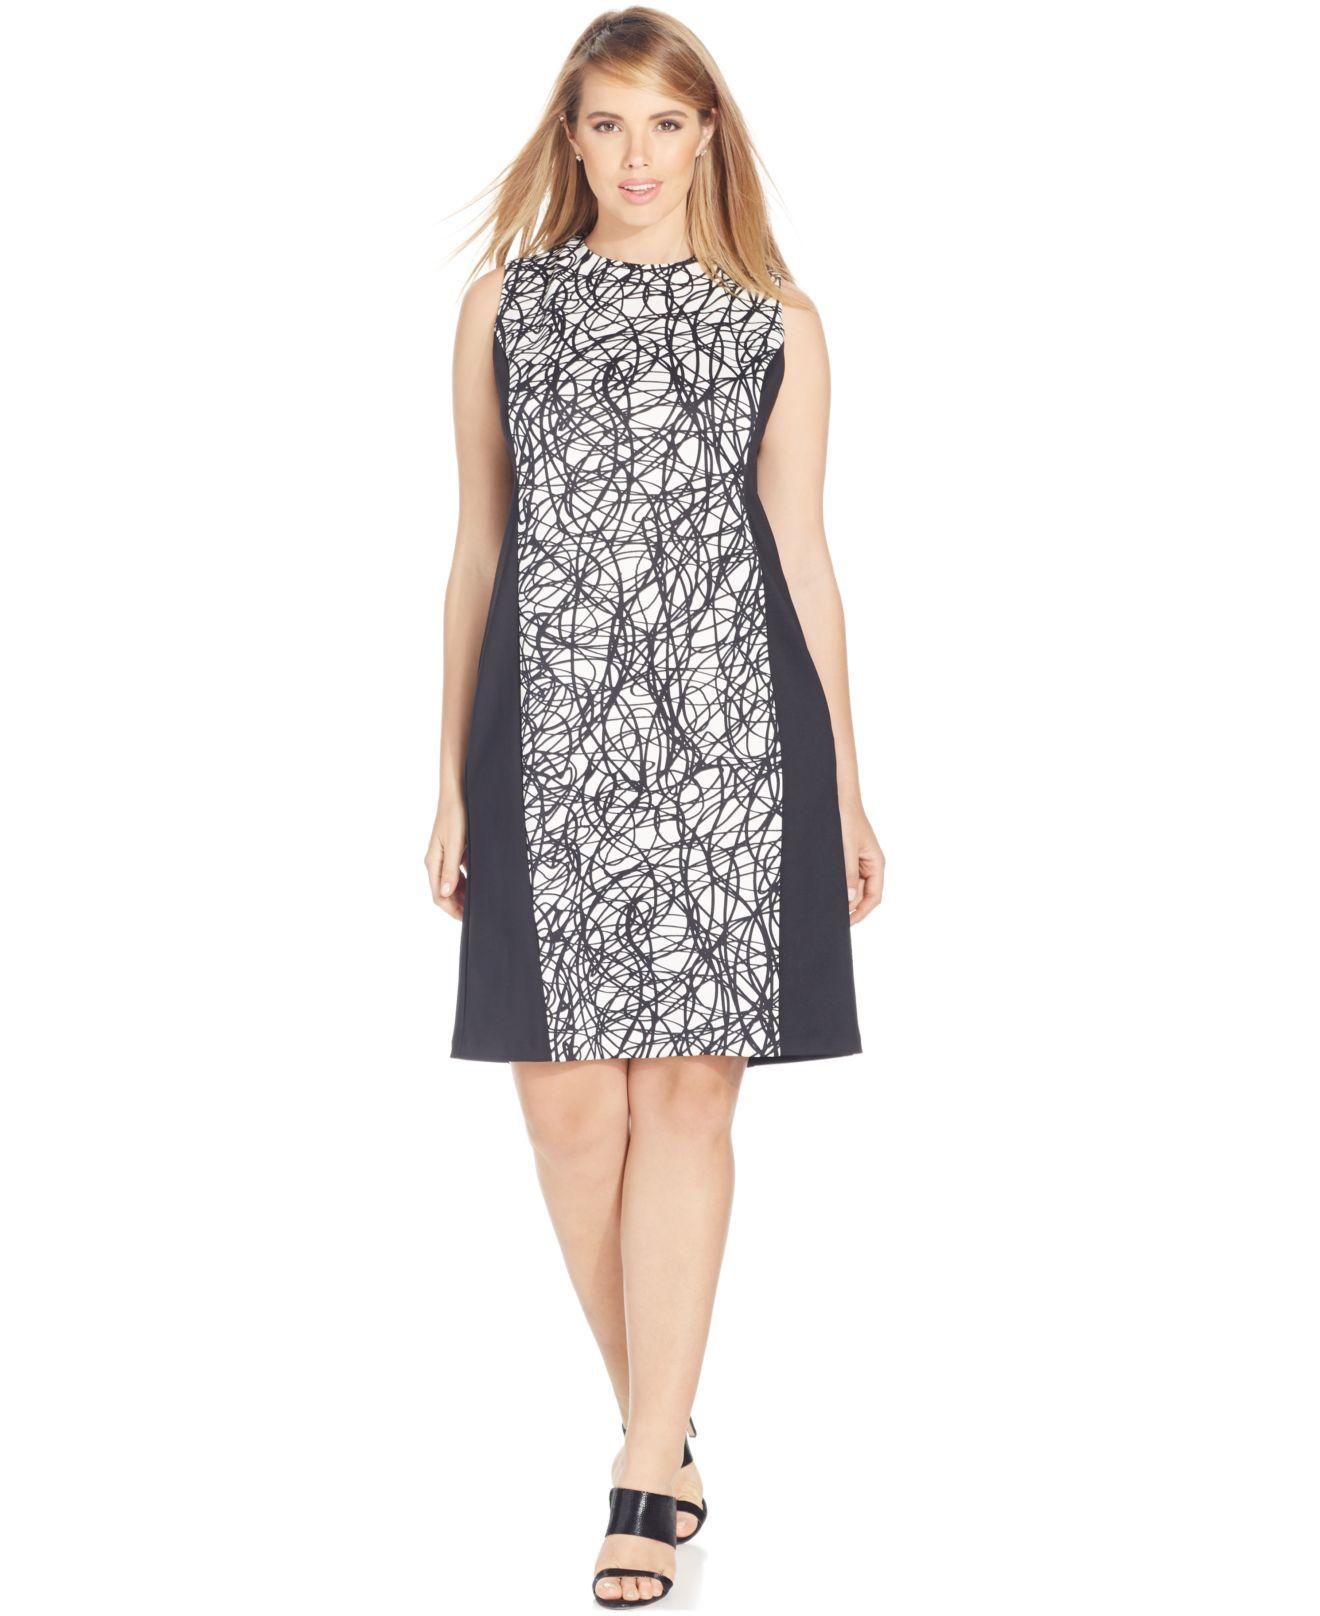 50638e1996a Lyst - Calvin Klein Plus Size Colorblocked Sheath Dress in Black